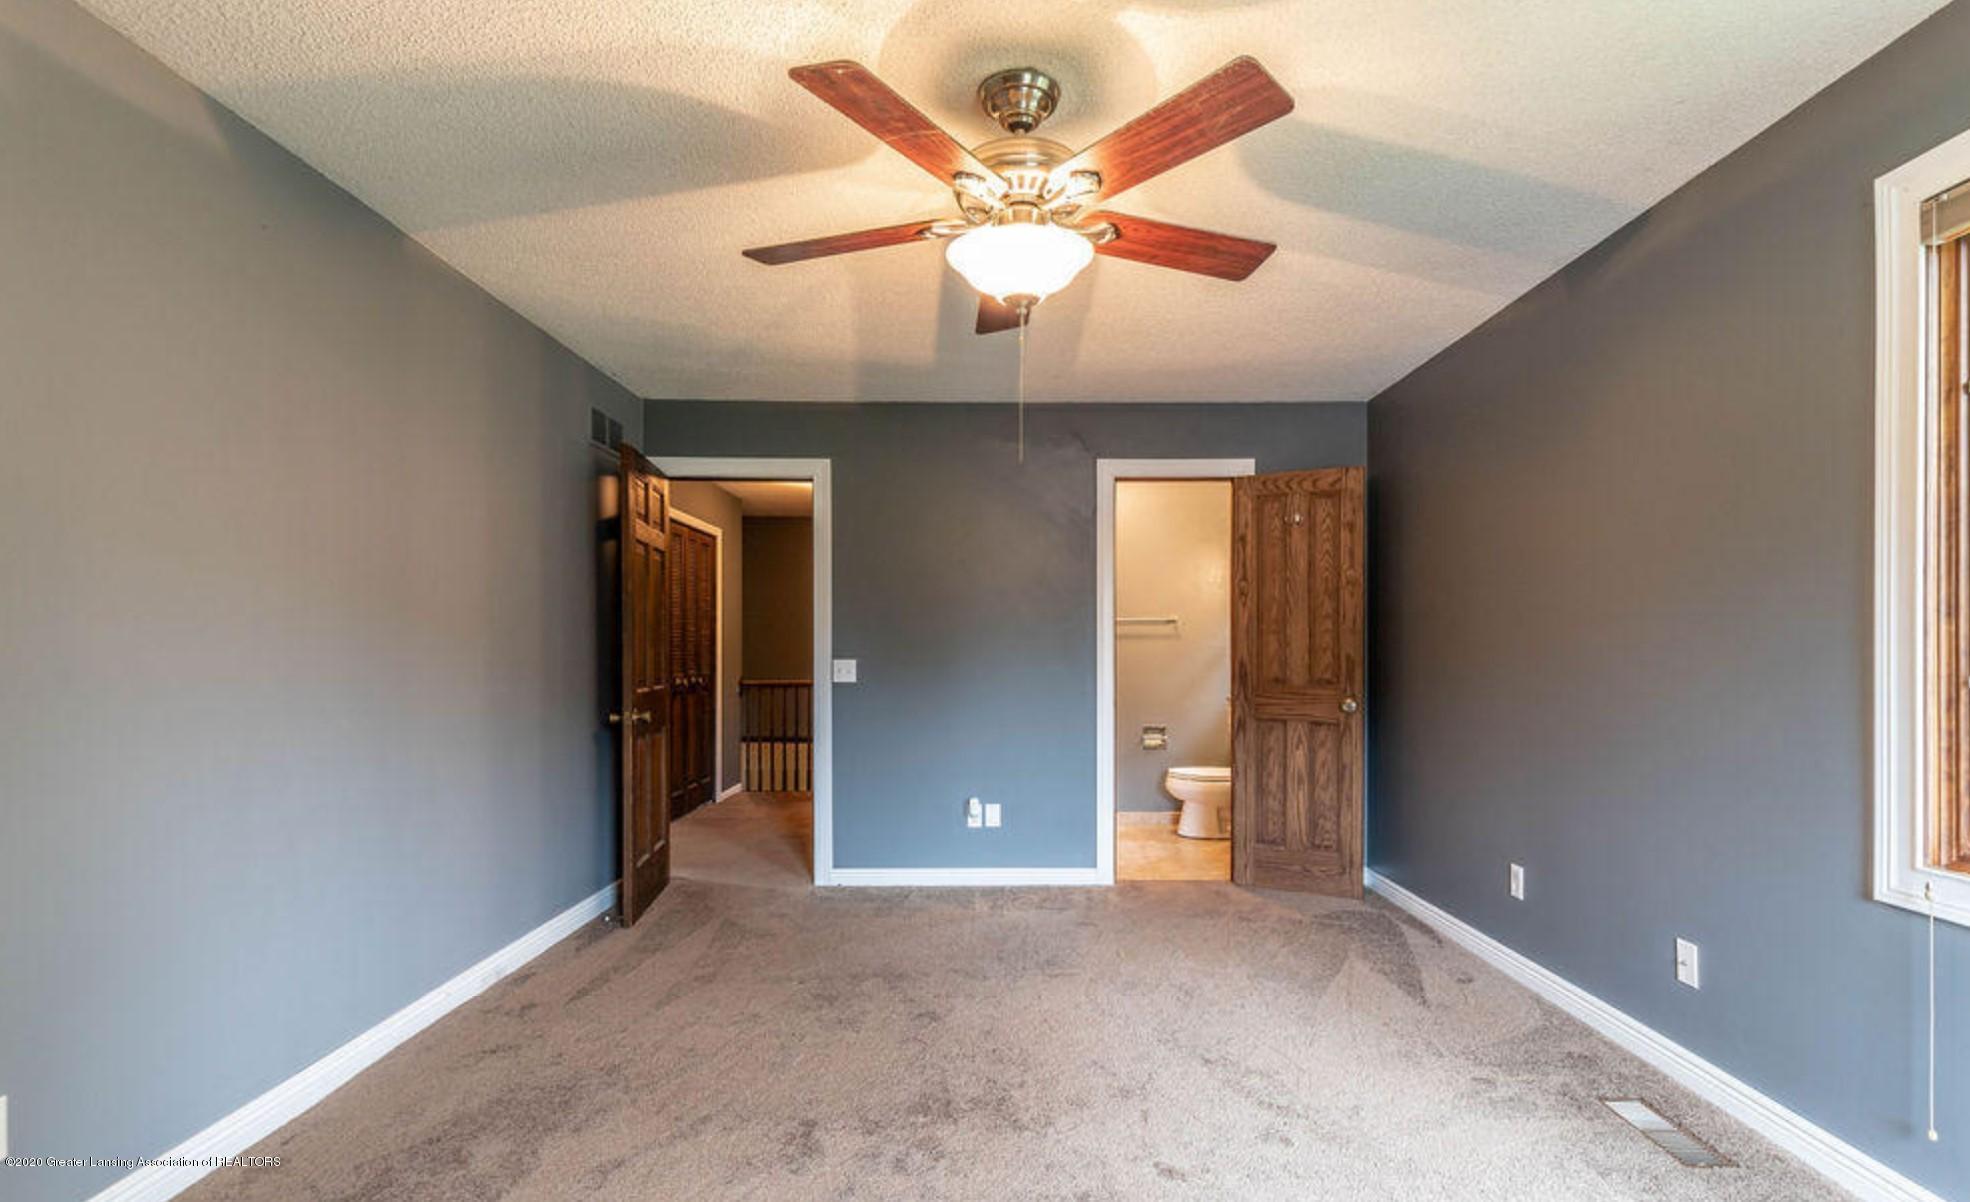 4215 Whitby Ln - Master Bedroom - 15